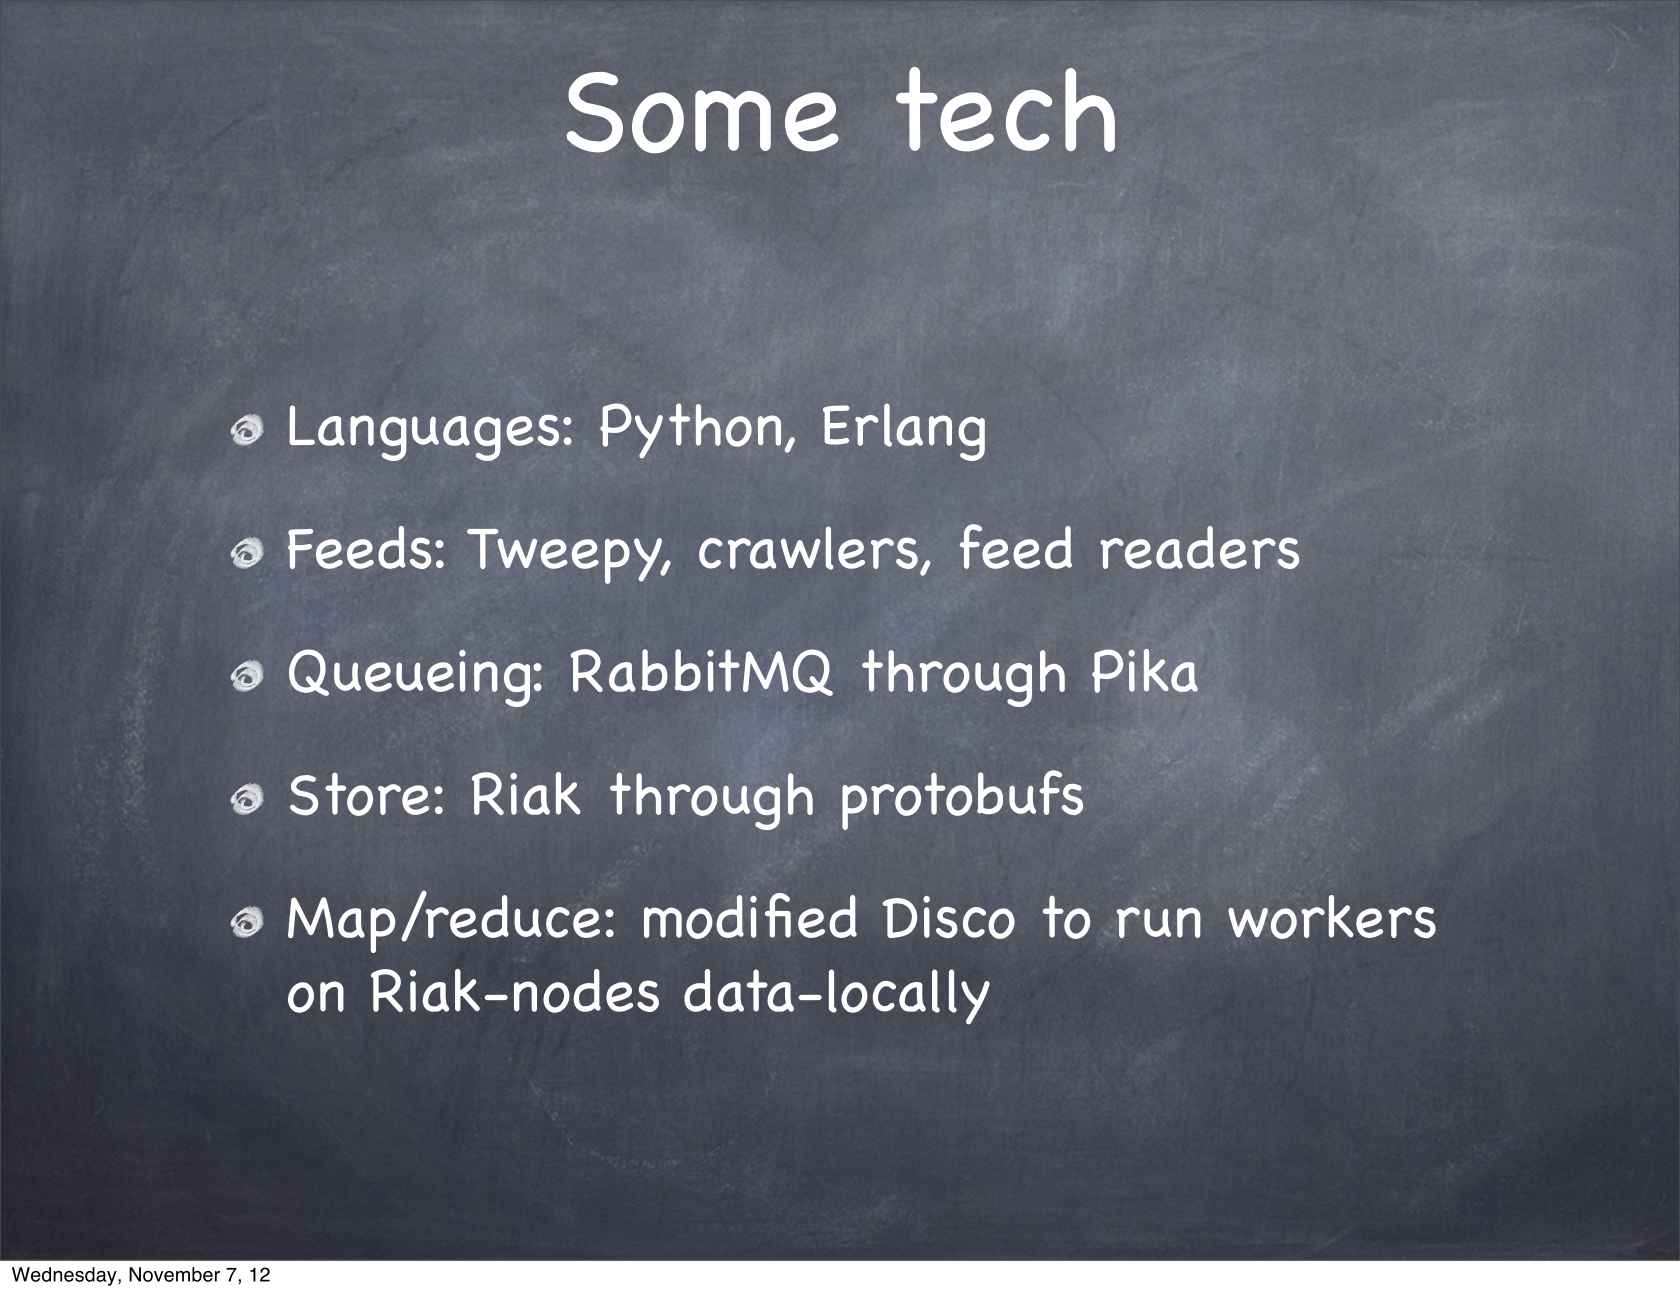 100% Big Data, 0% Hadoop, 0% Java